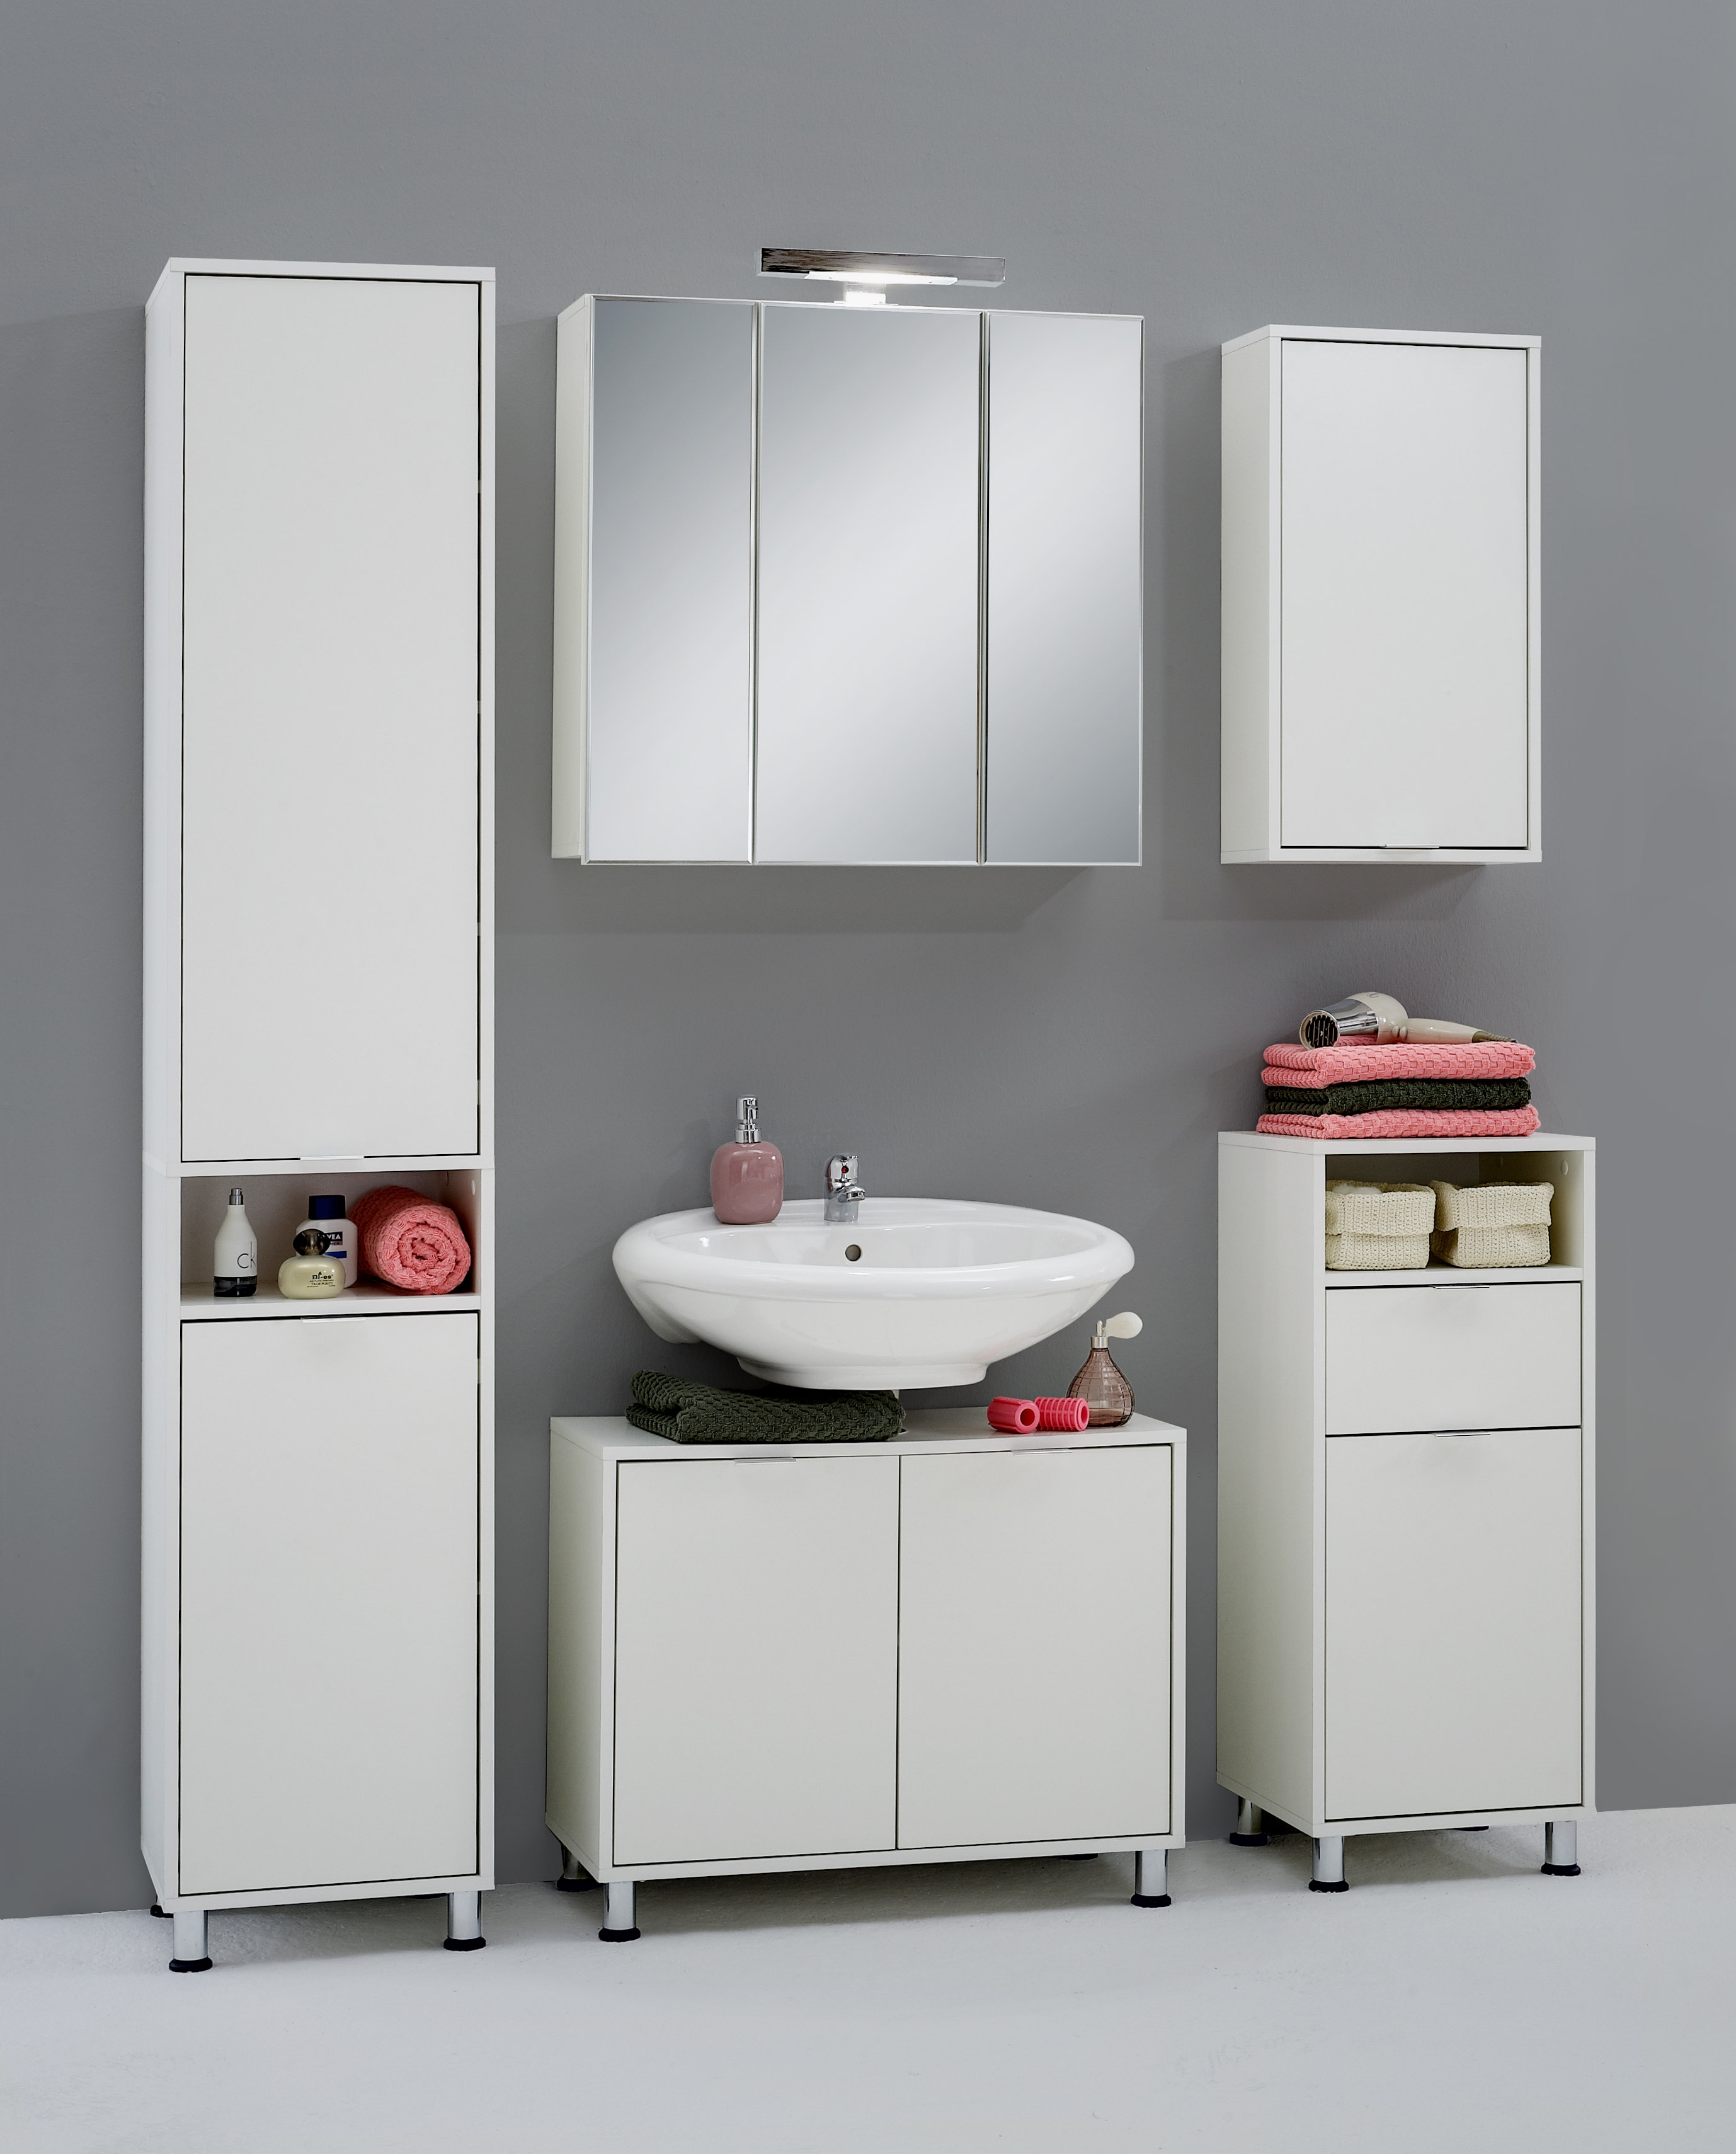 Fmd Möbel Zamora Badezimmer Wandschrank